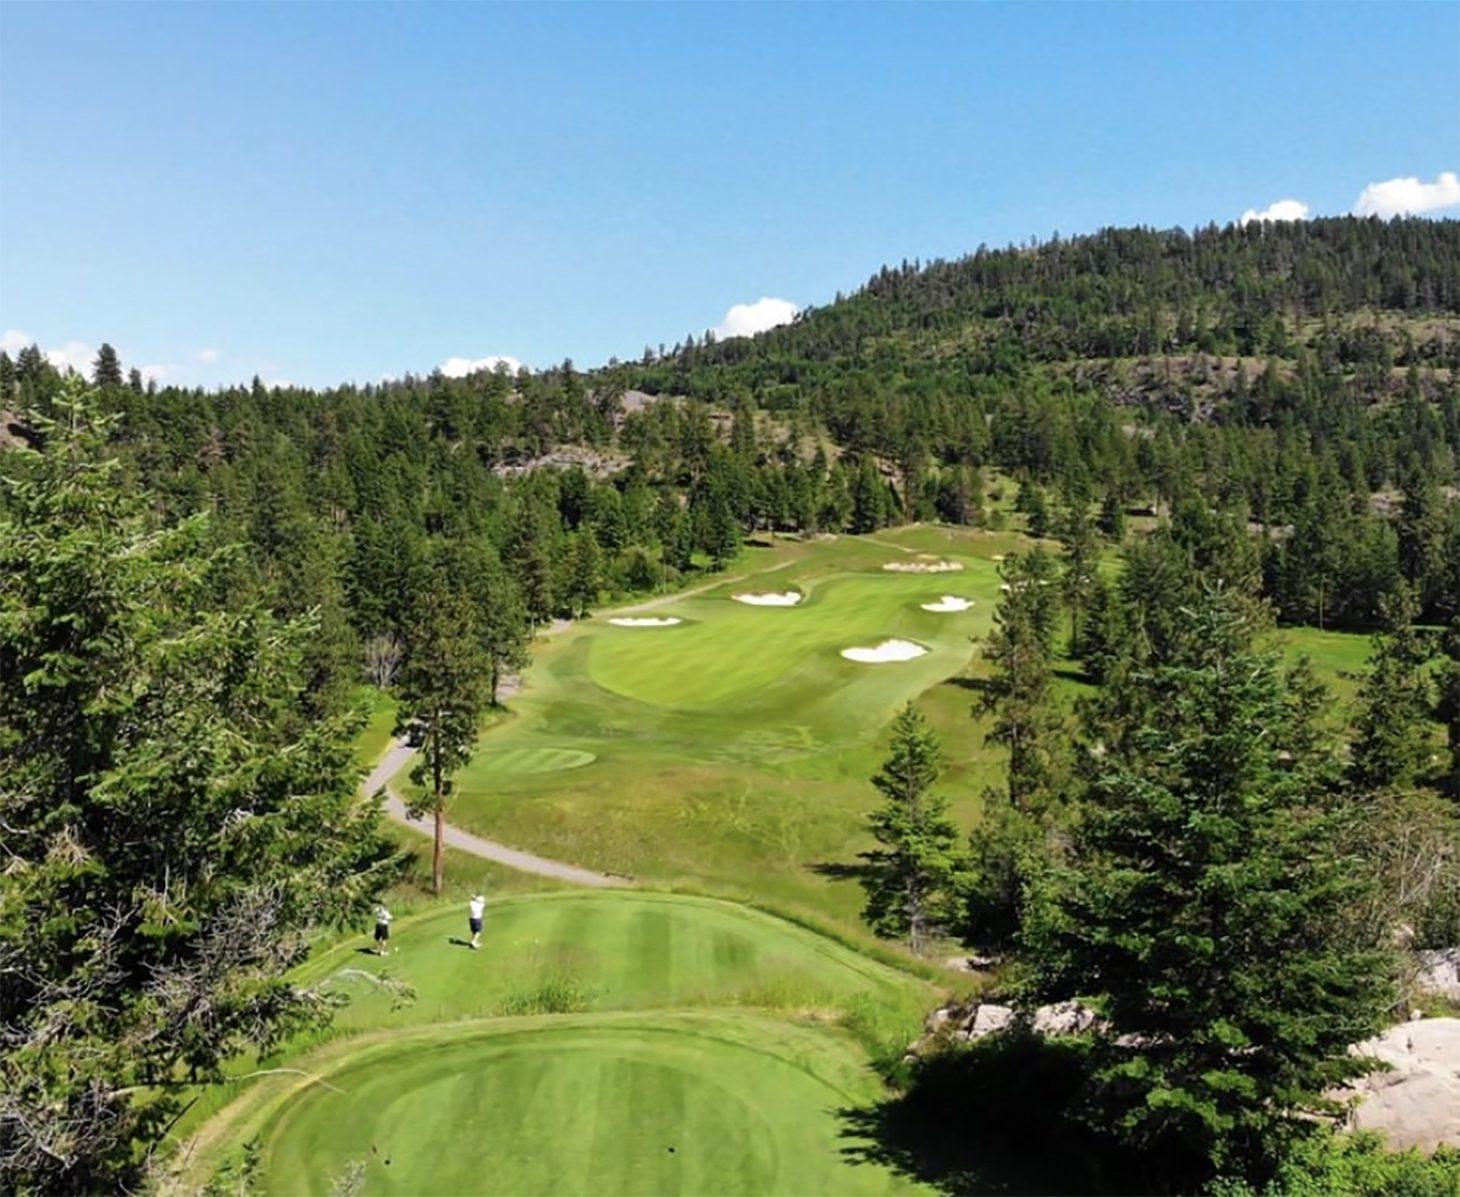 Predator Ridge Golf Course and Resort